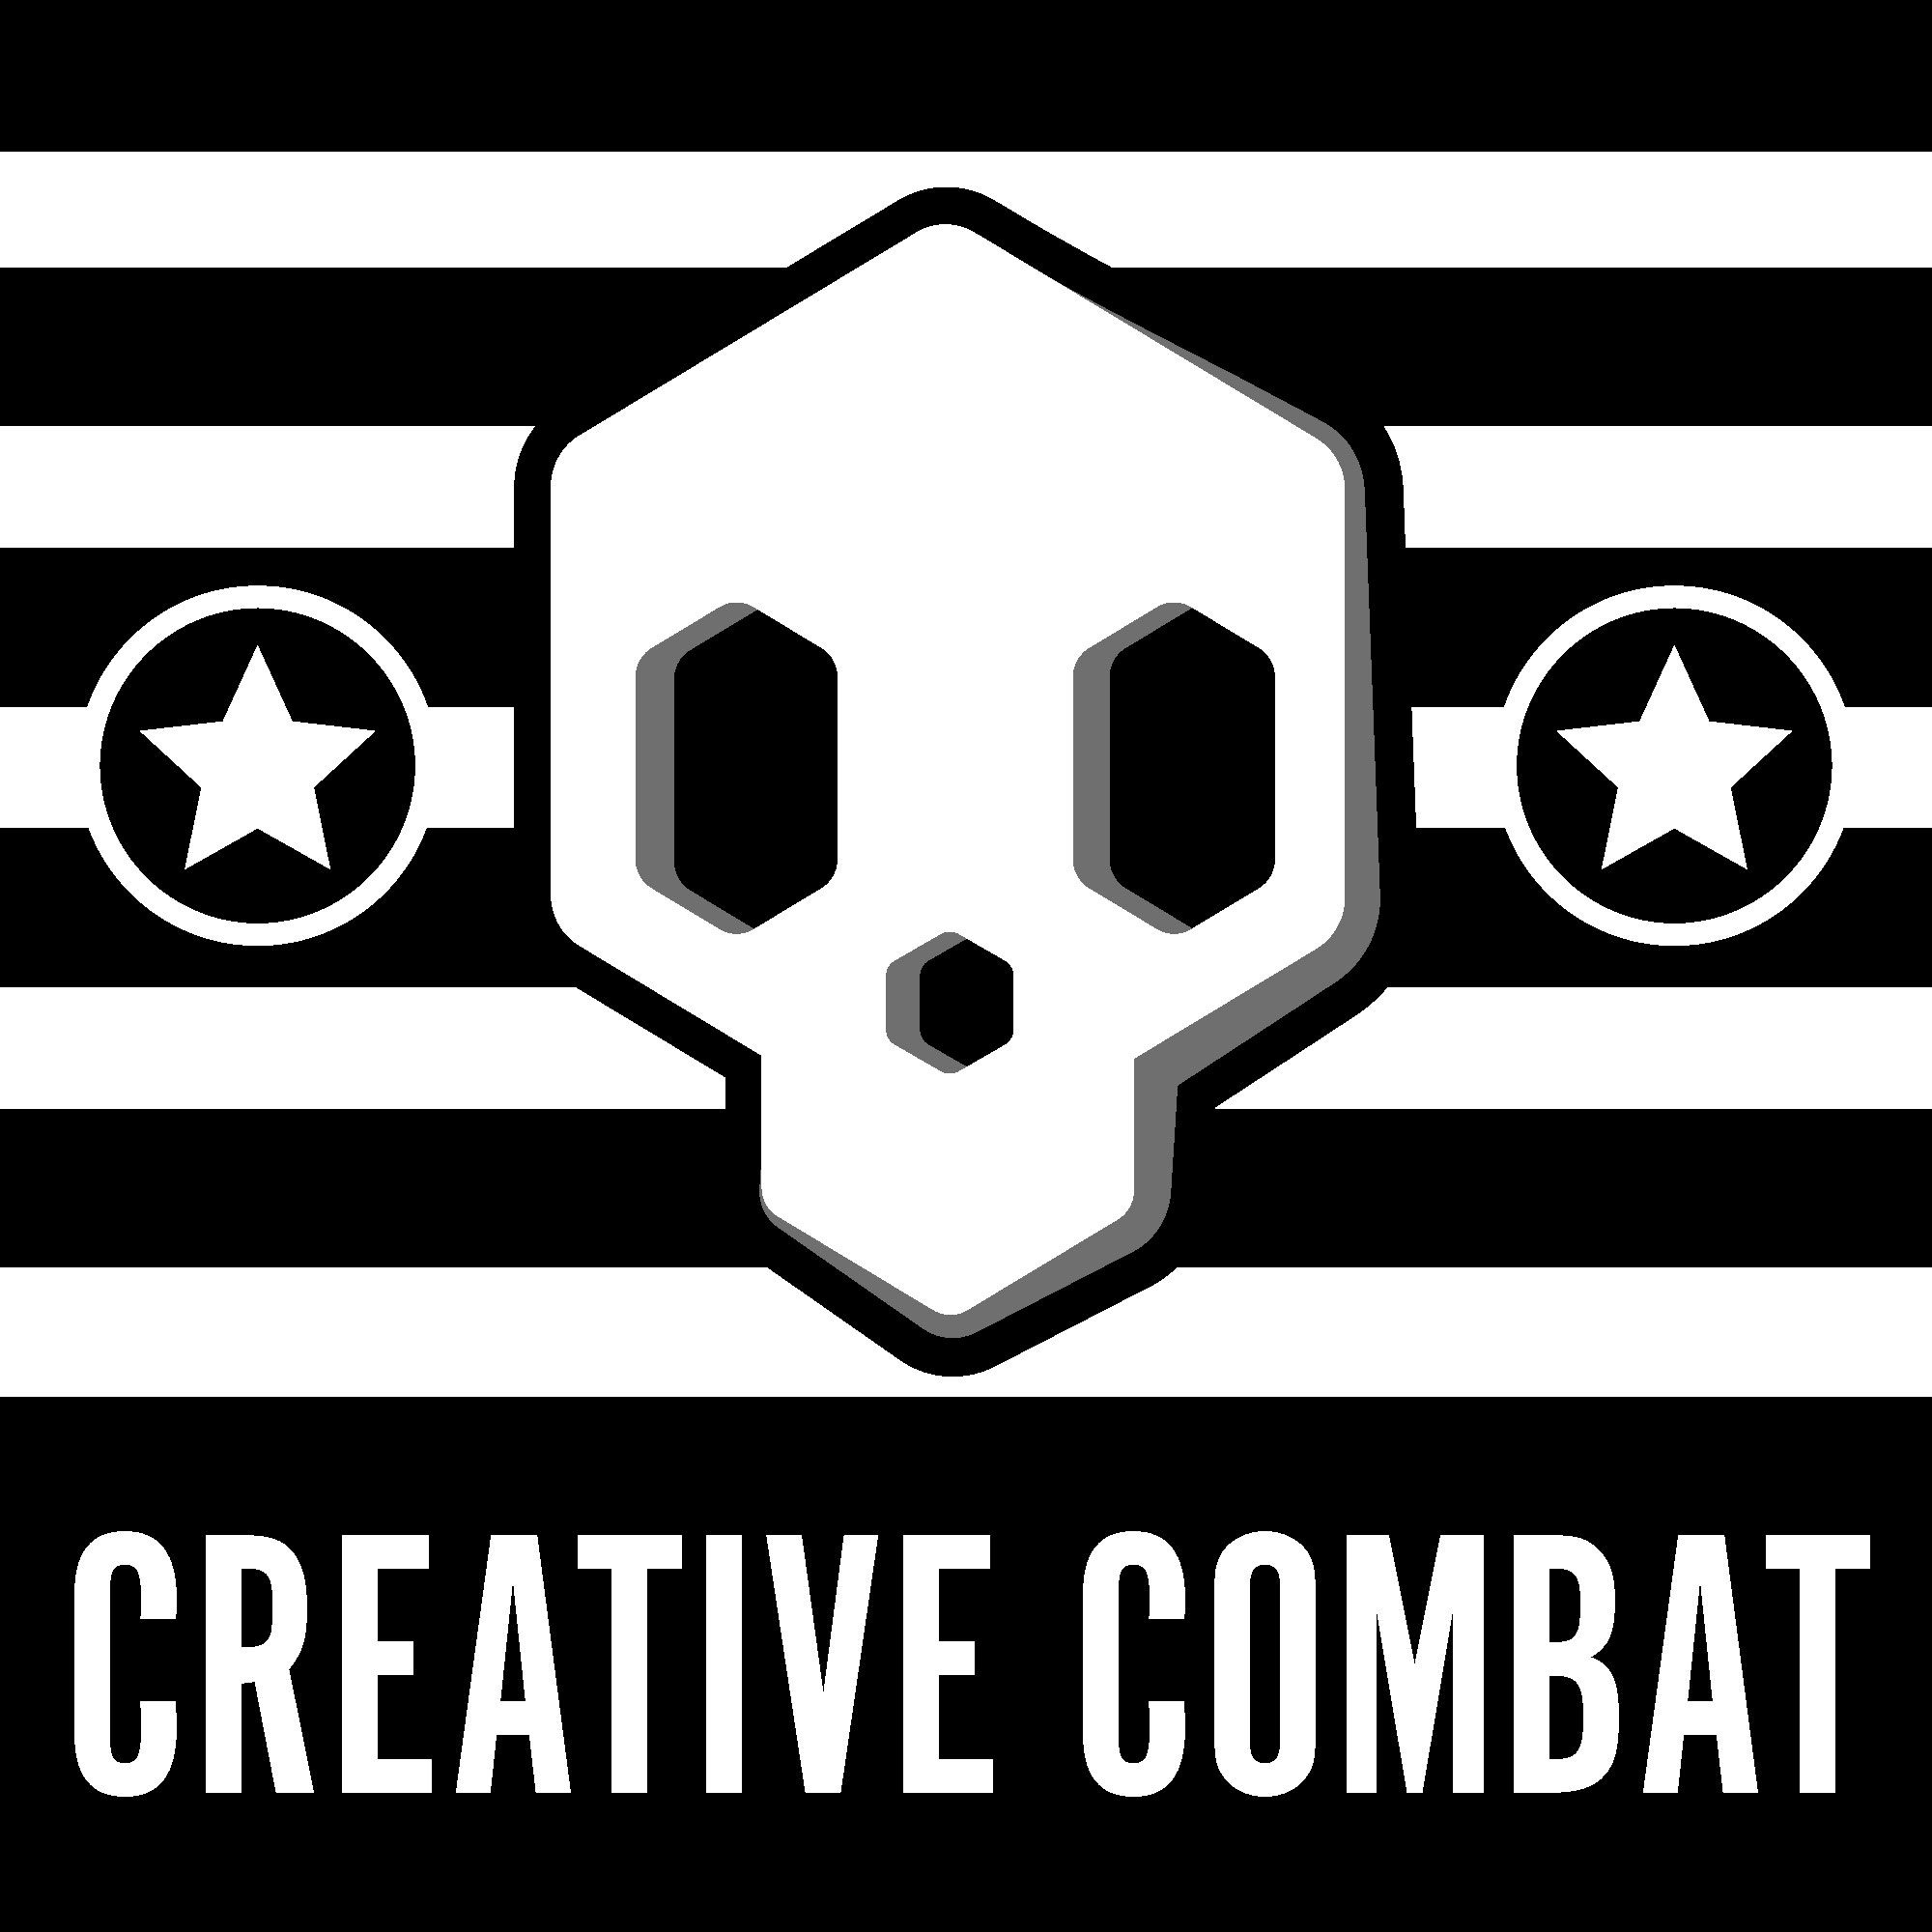 Creative Combat